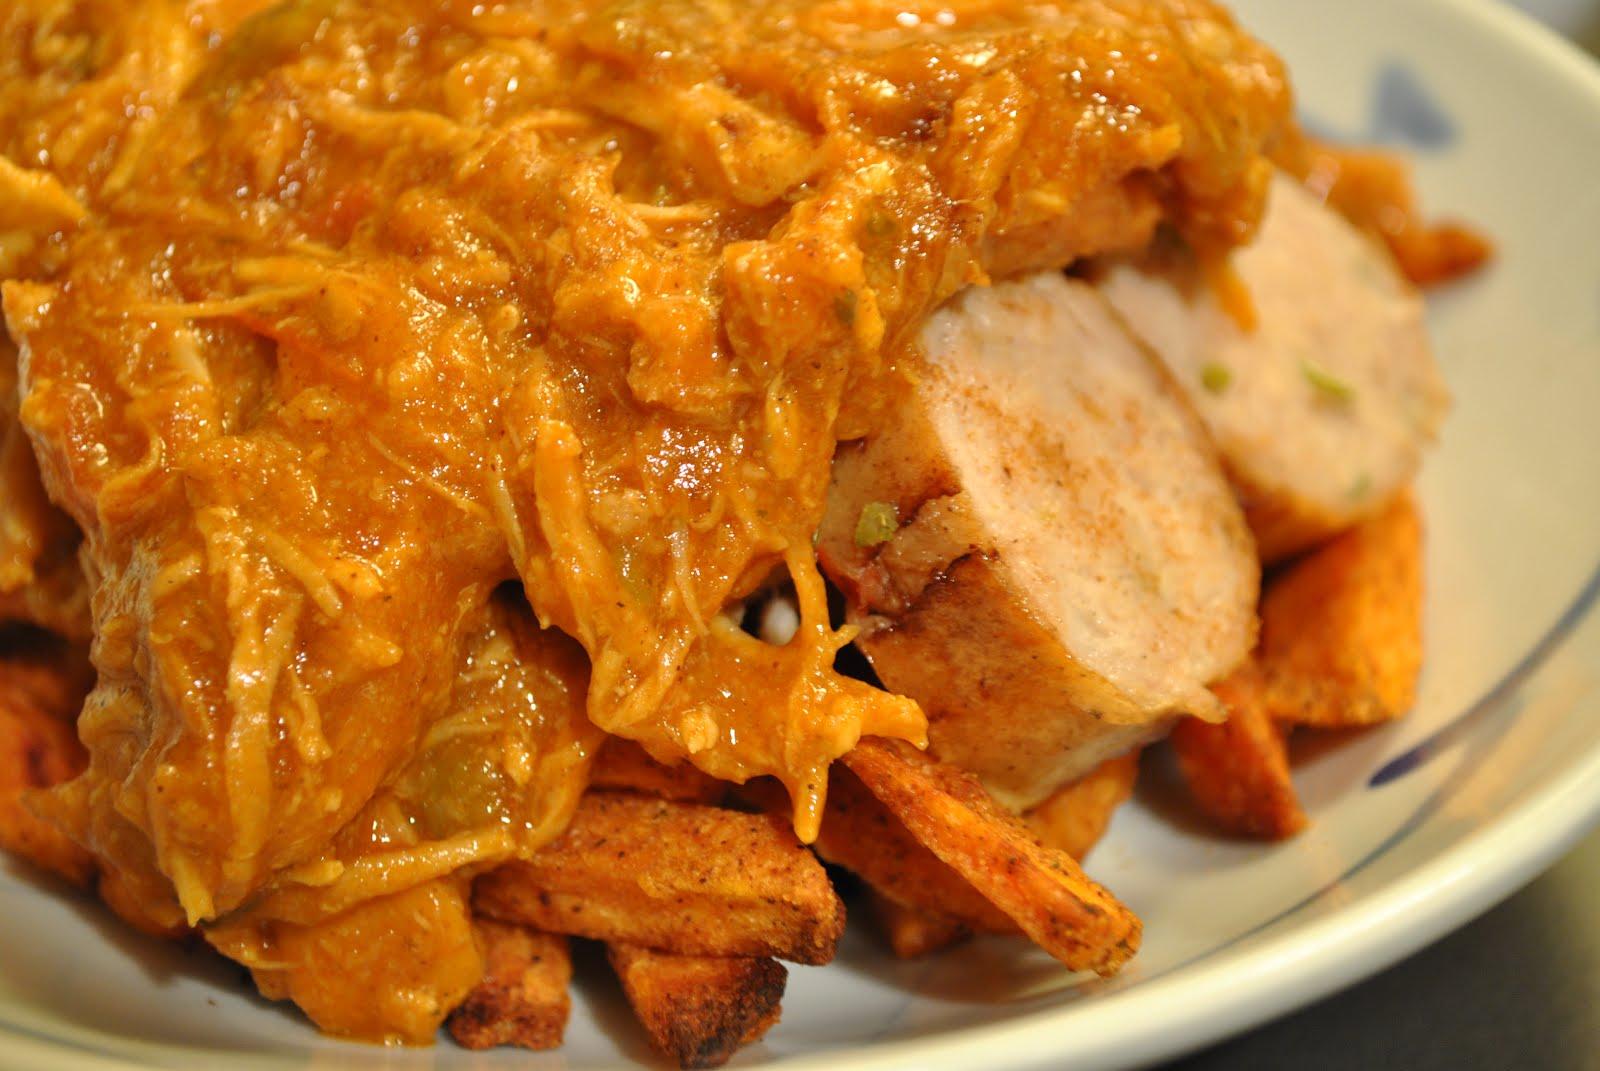 german currywurst - photo #27